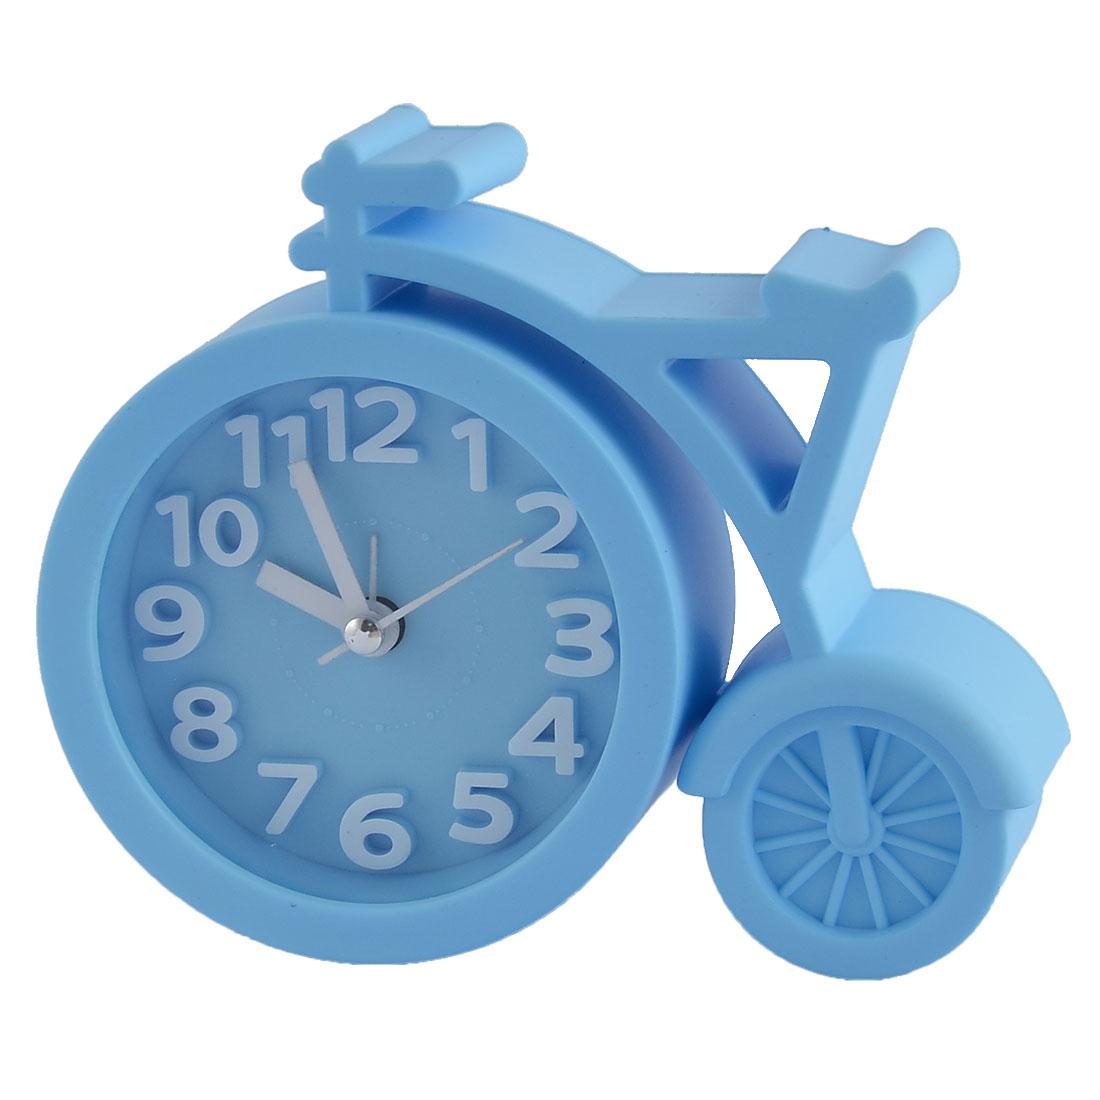 Household Office Desktop Plastic Bike Shaped Silent Battery Powered Arabic Number Alarm Clock Blue